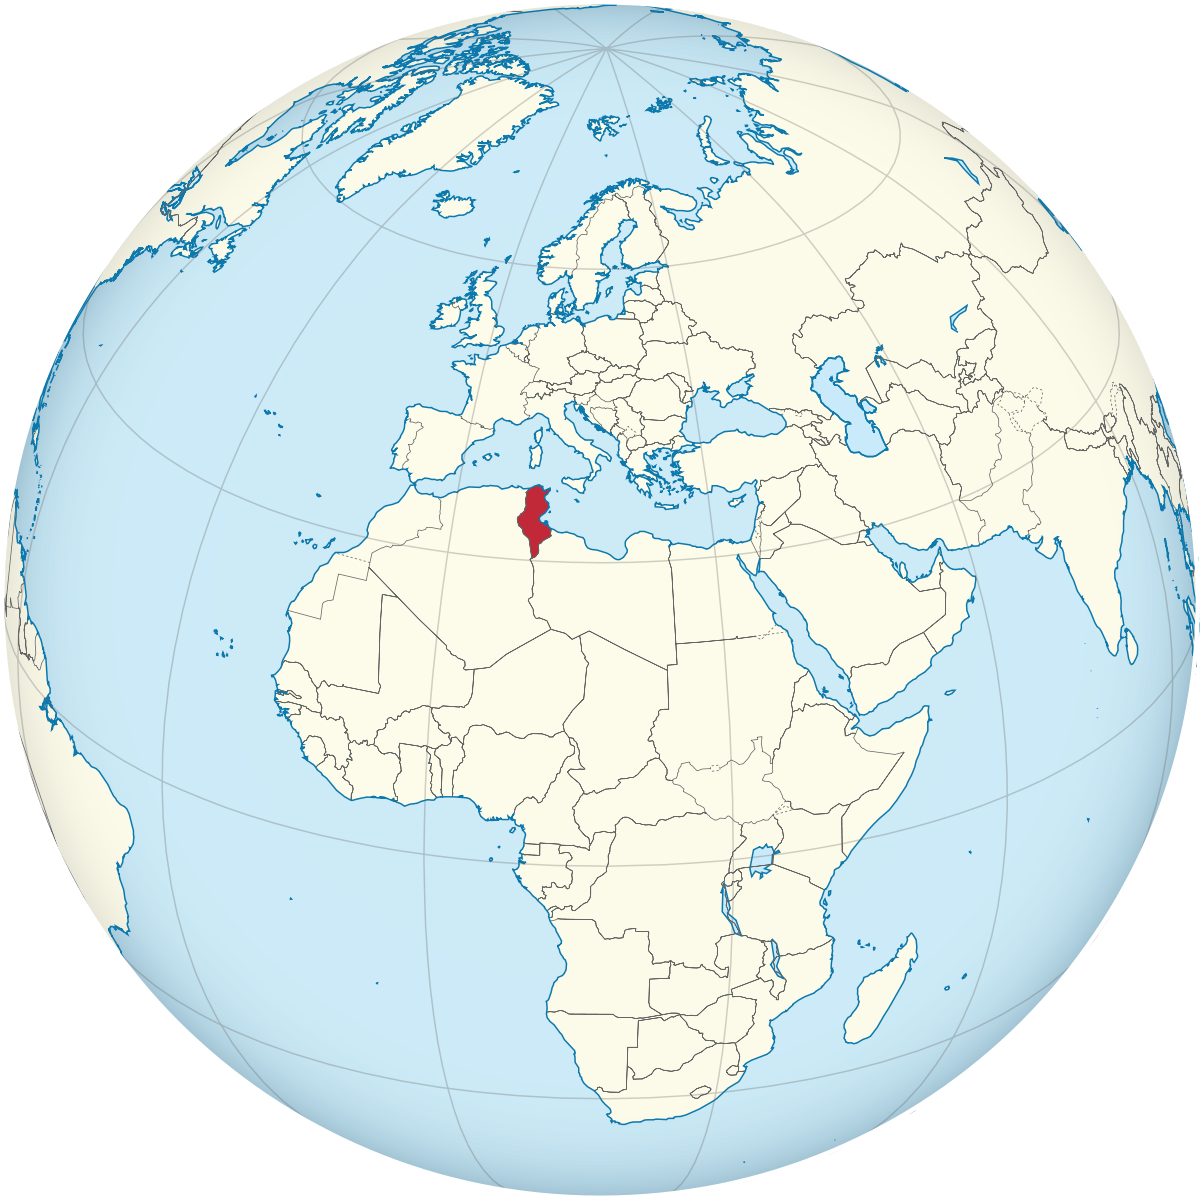 Tunisia on the globe